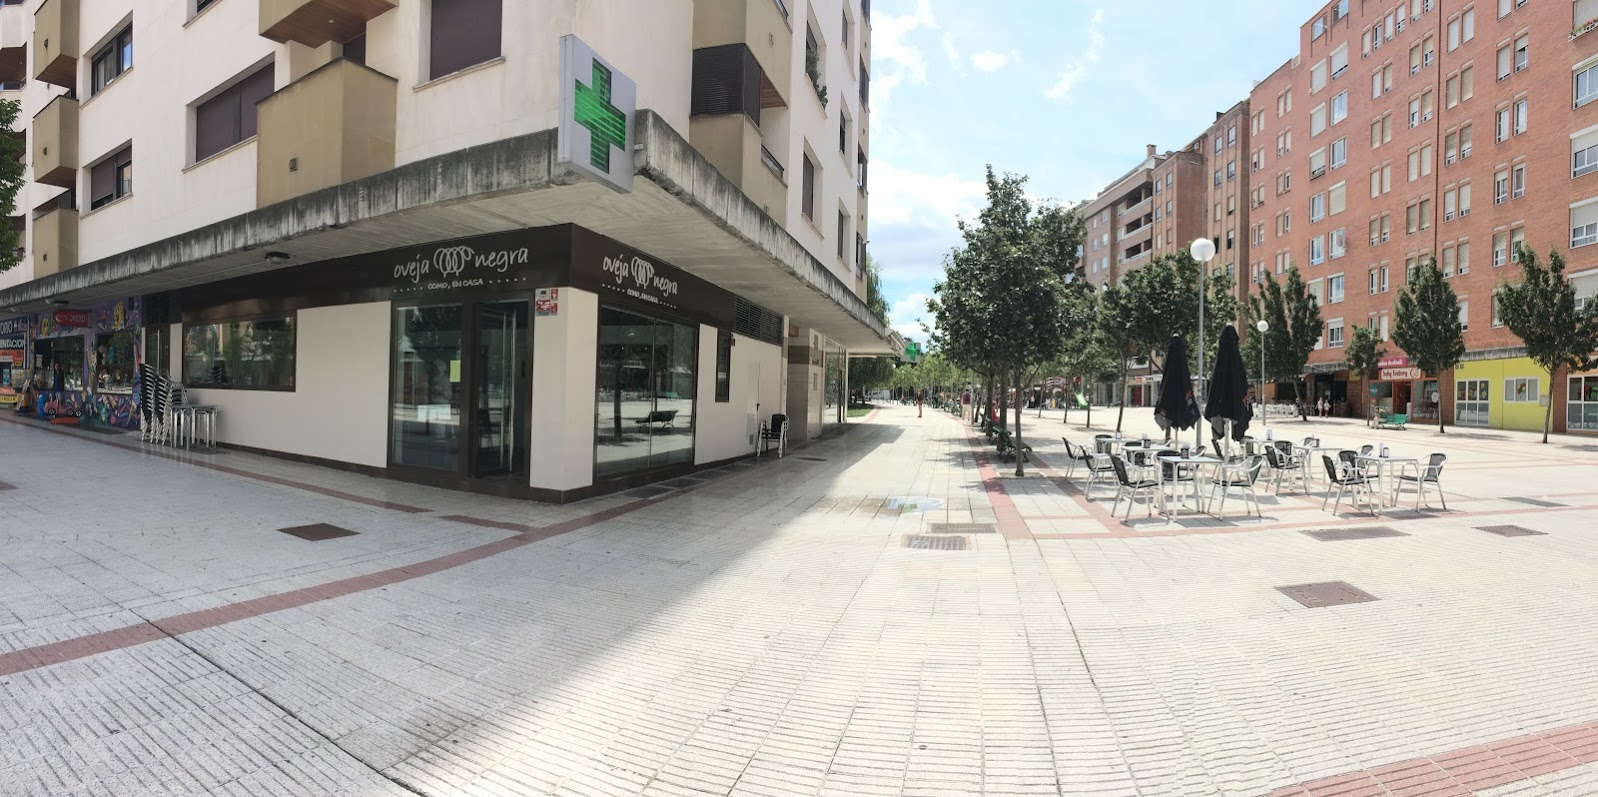 Oveja_Negra_Hosteleria_Reforma_Local_Pamplona_02